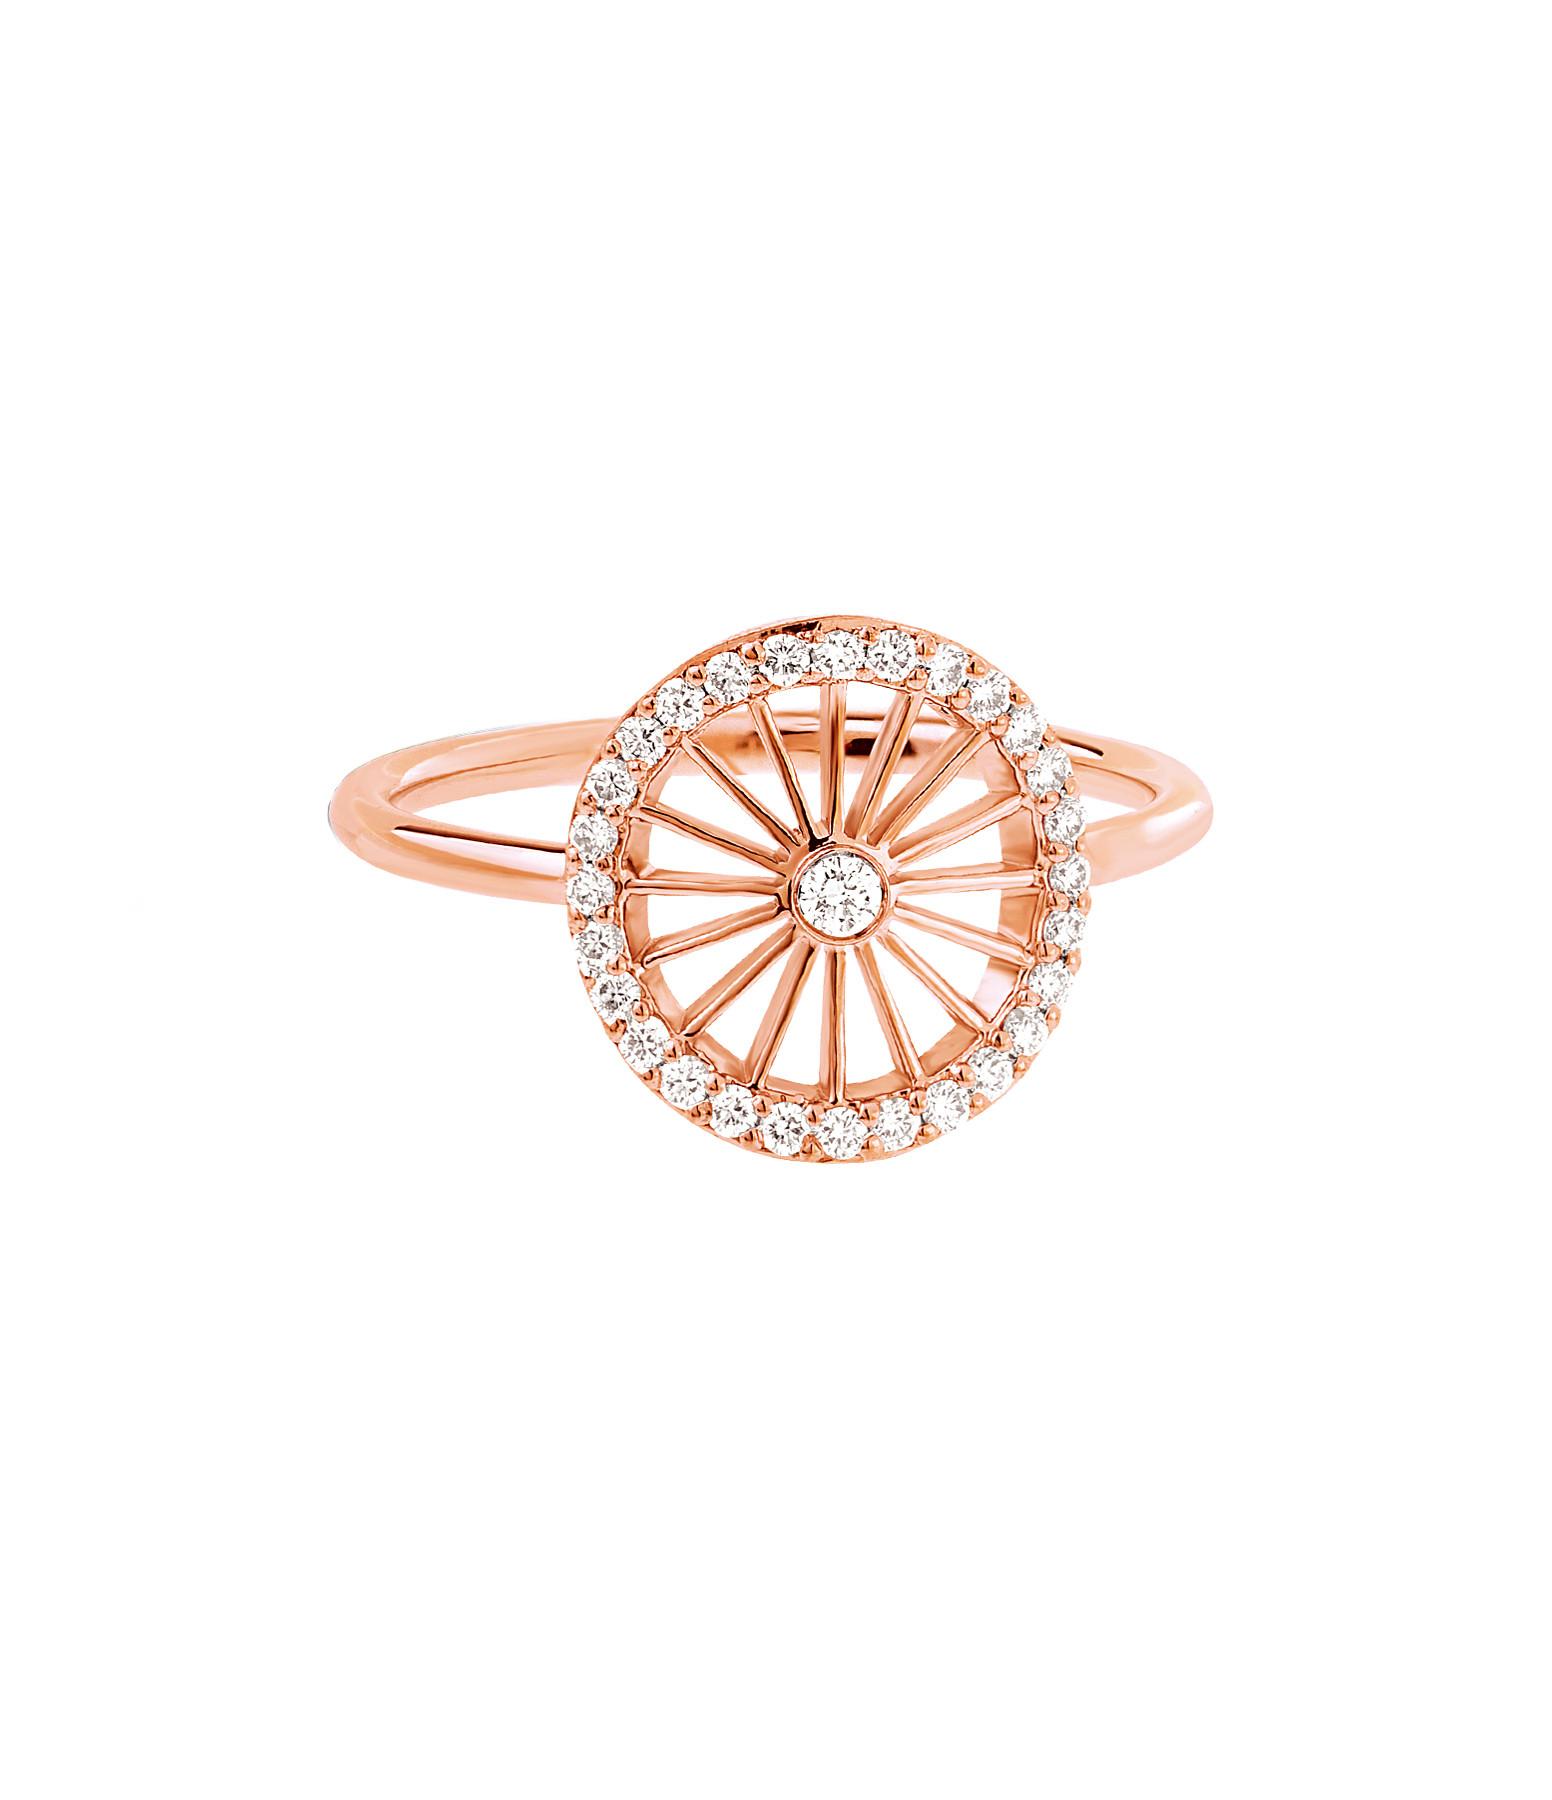 NAVA JOAILLERIE - Bague Cheyenne Ronde Diamants Or Rose